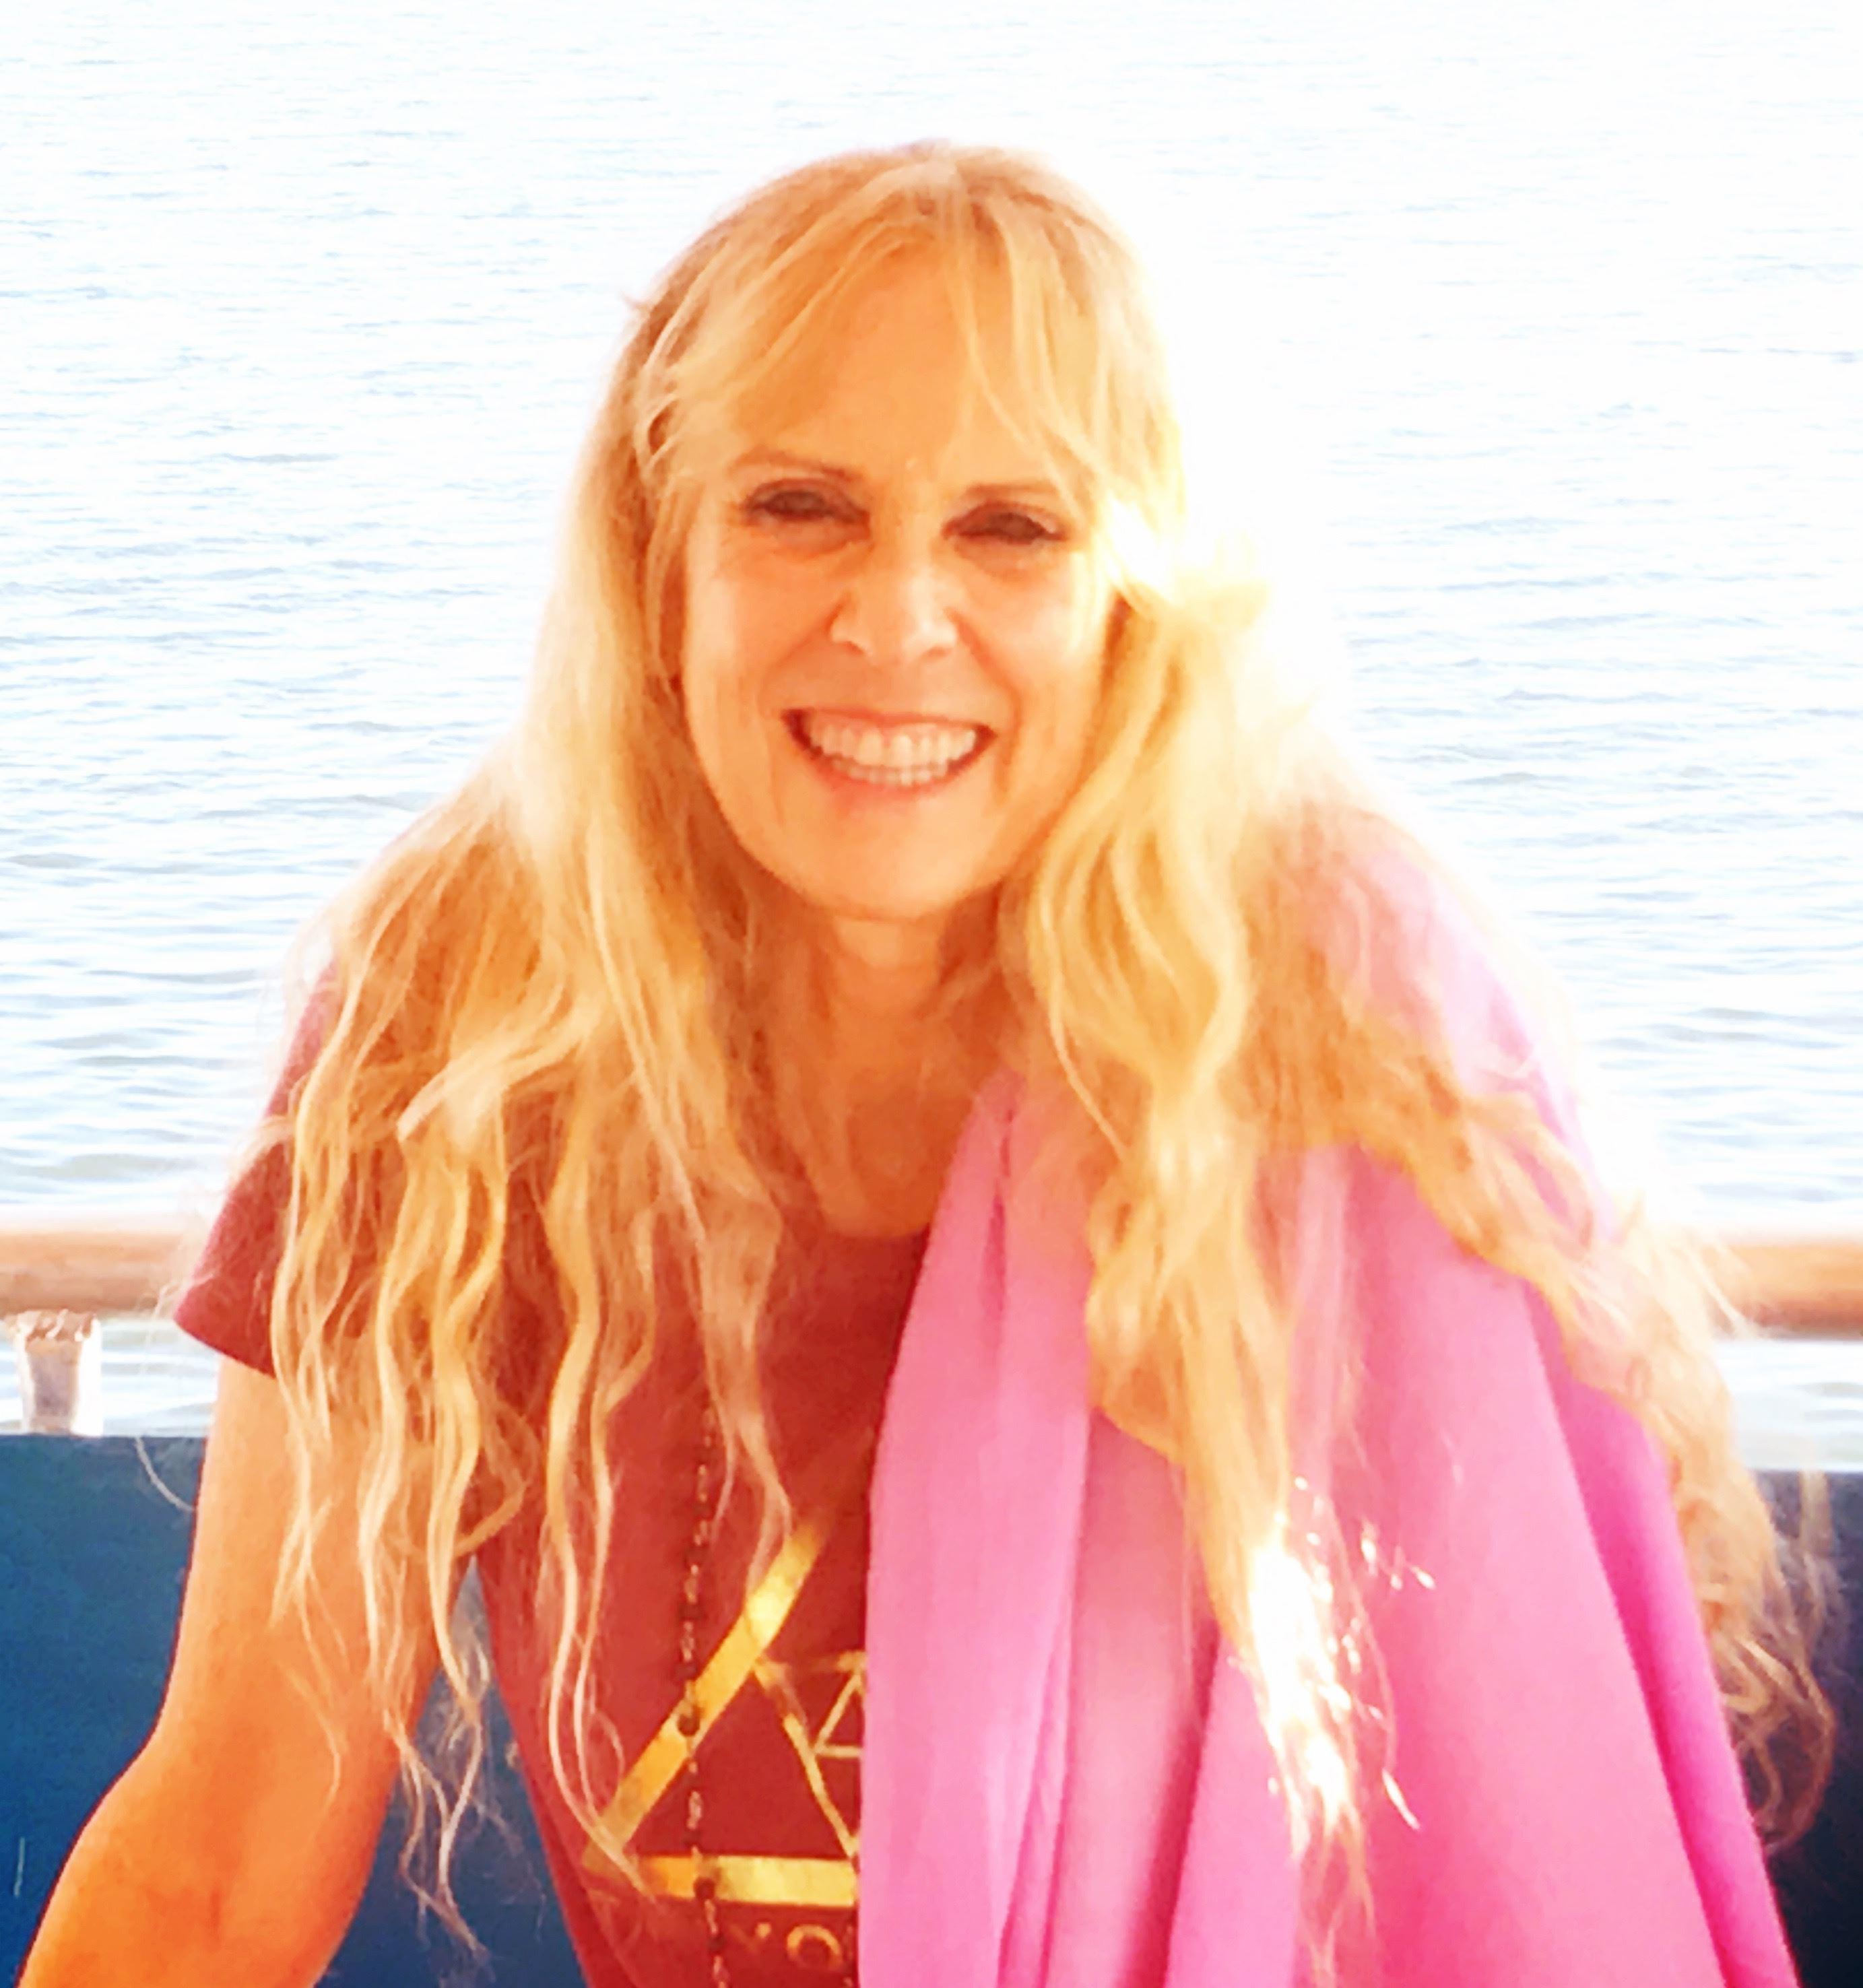 Yogini Kaliji on boat